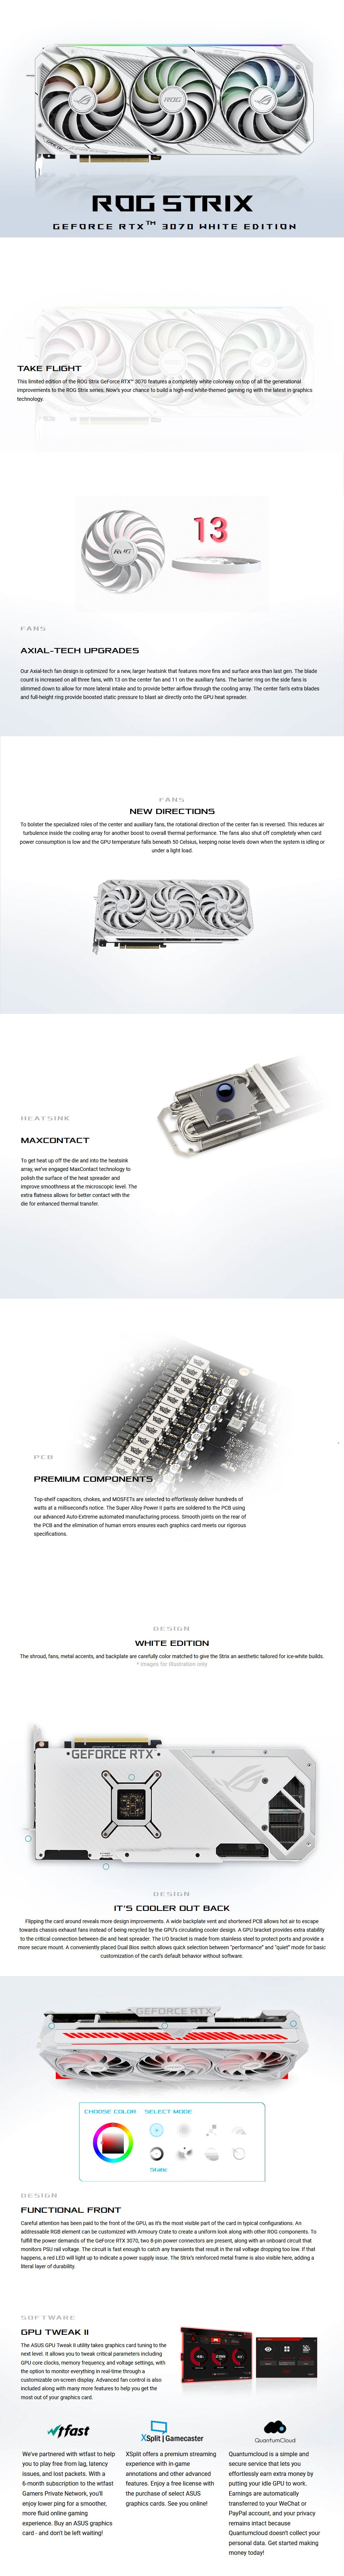 asus-geforce-rtx-3070-rog-strix-oc-8gb-video-card-white-ac41325-5.jpg